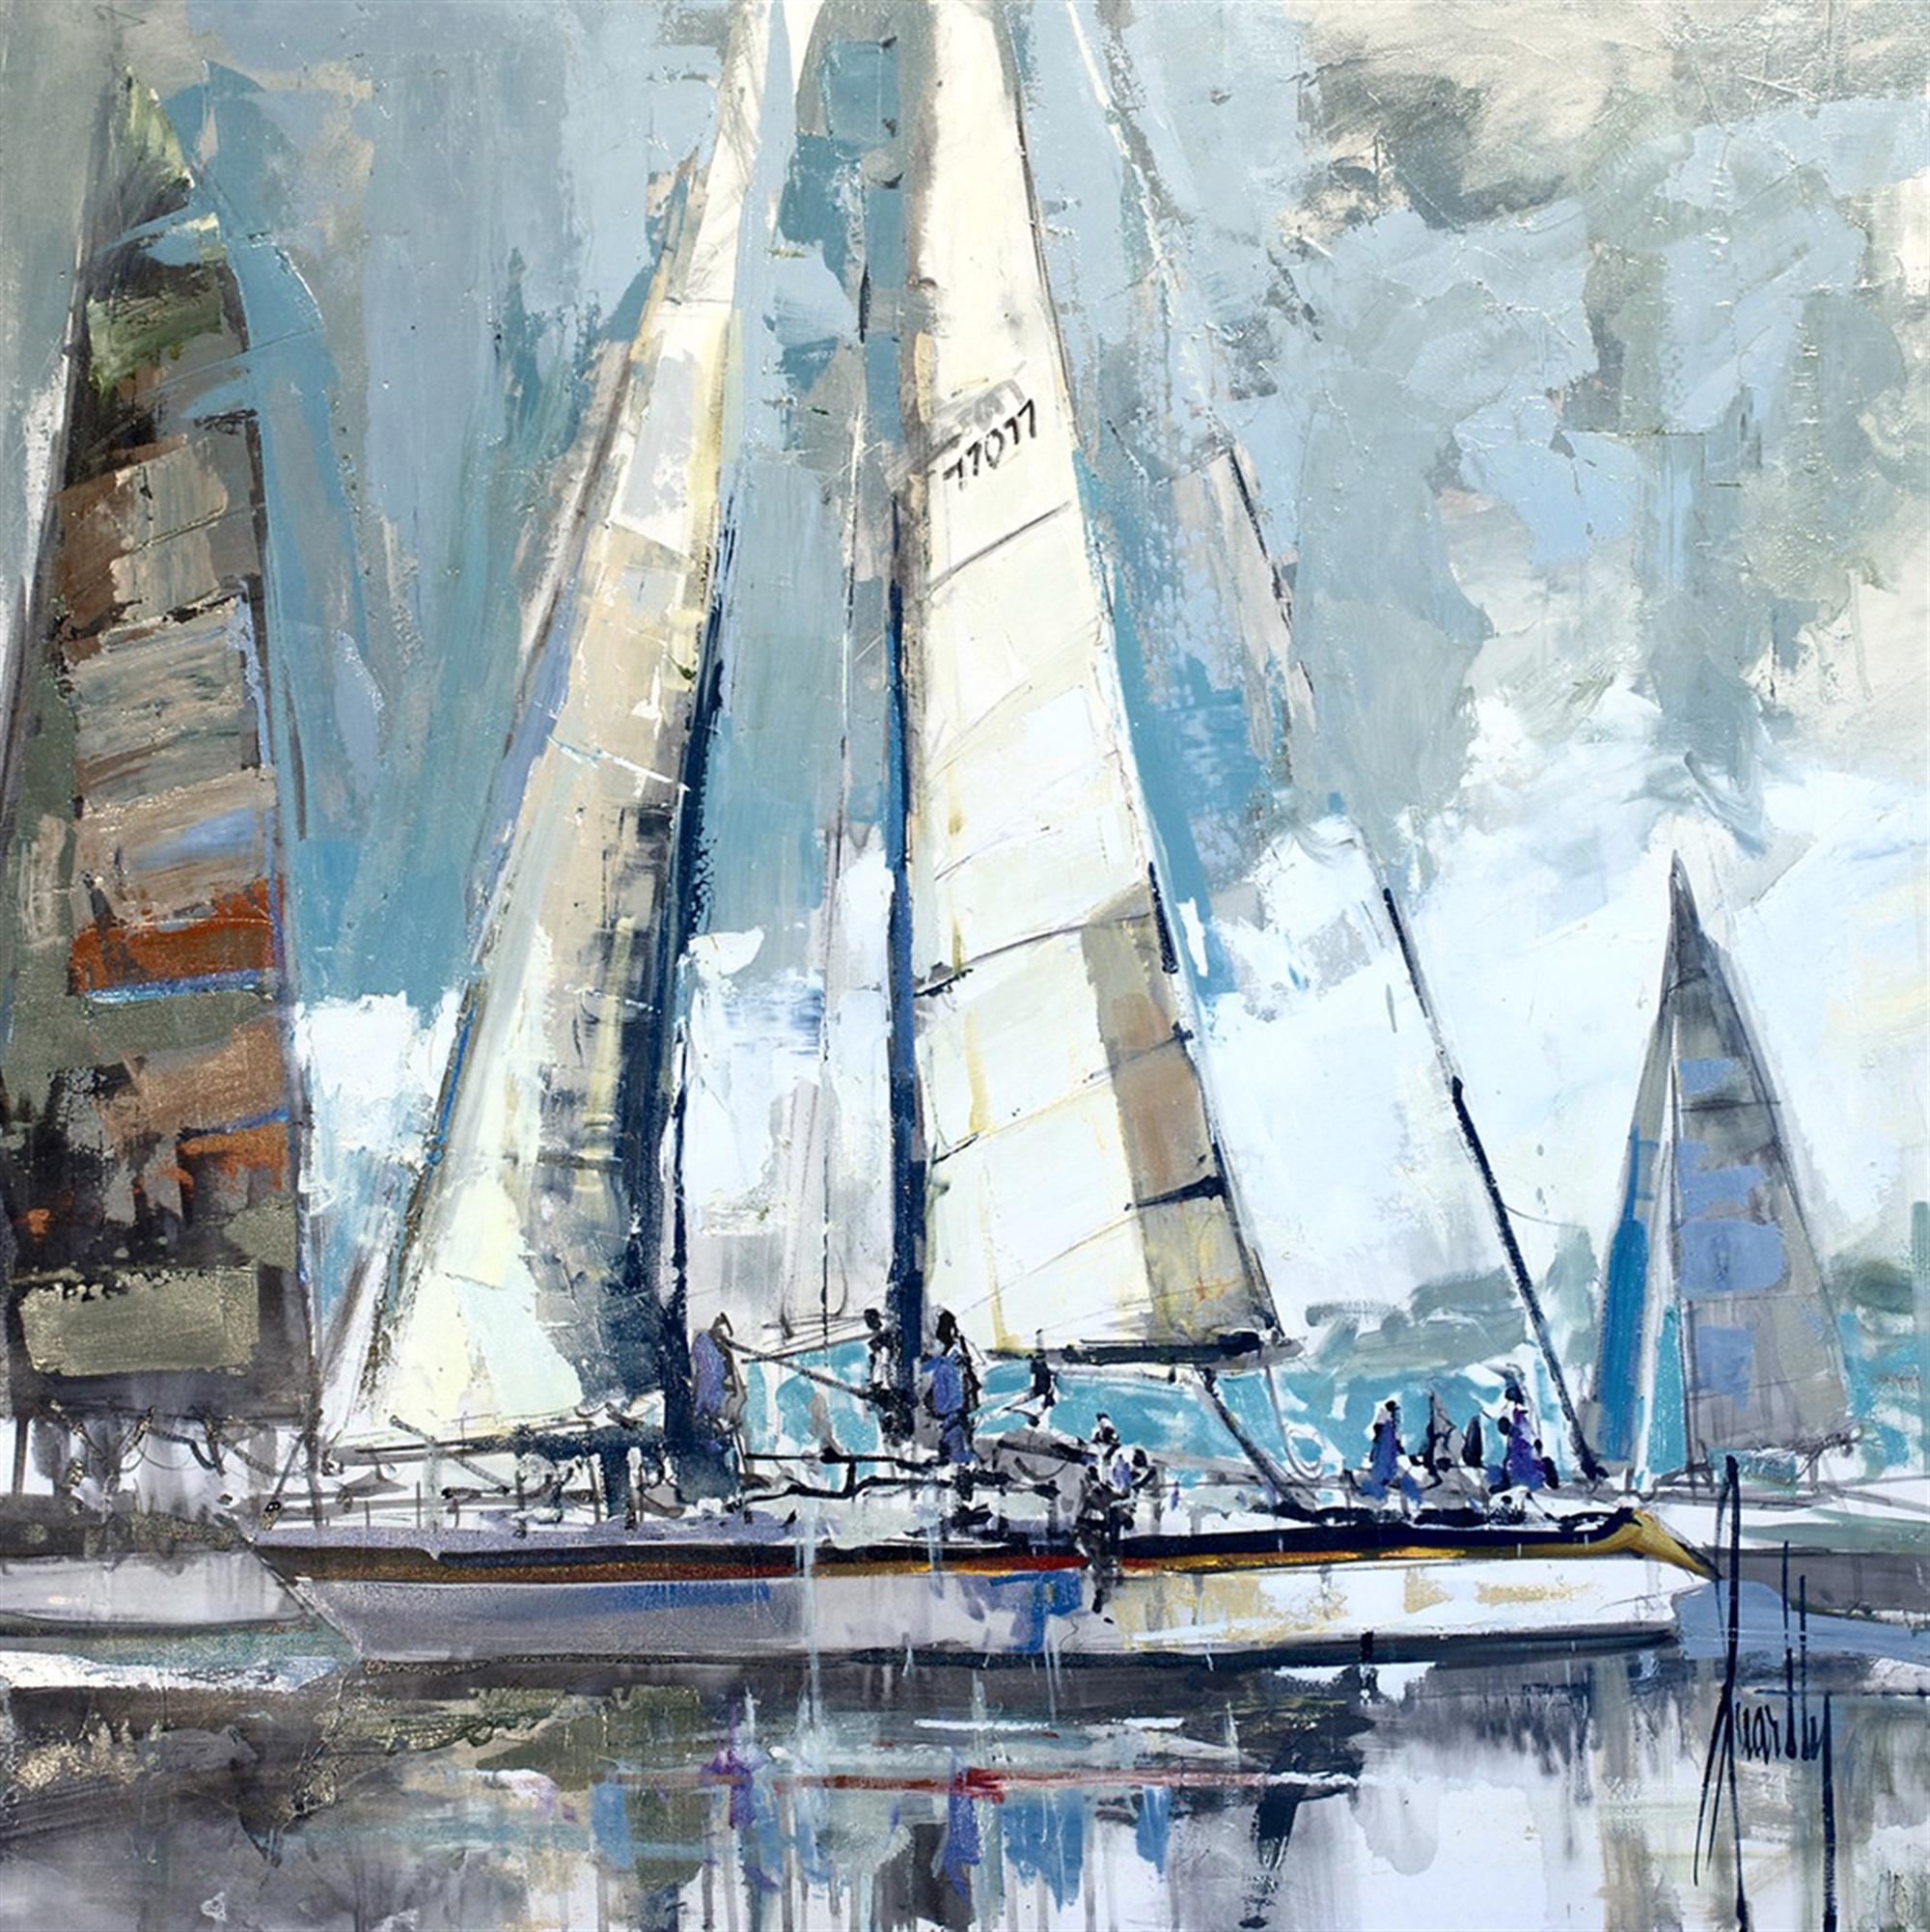 Setting Sail by Steven Quartly